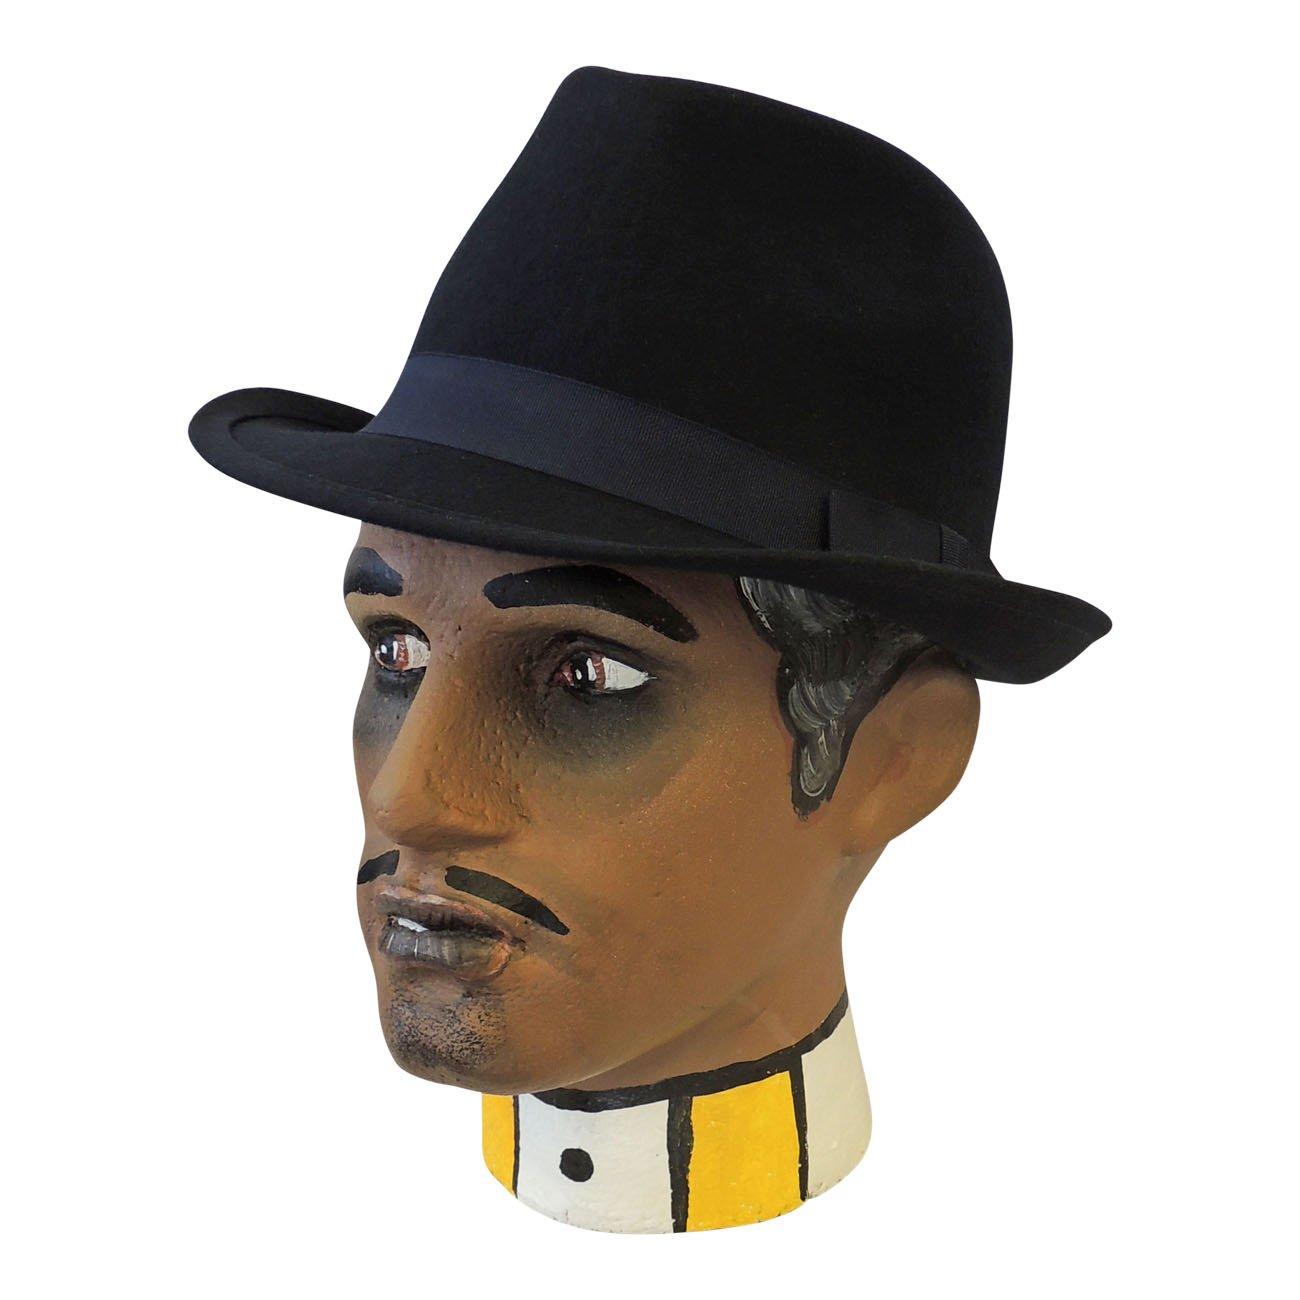 59aee389a1cab4 Viva-la-Rosa Men's Classic 1930's 1940's VTG Style Wool Felt Gangster Mafia  Trilby Hat: Rosa Rosa: Amazon.co.uk: Clothing